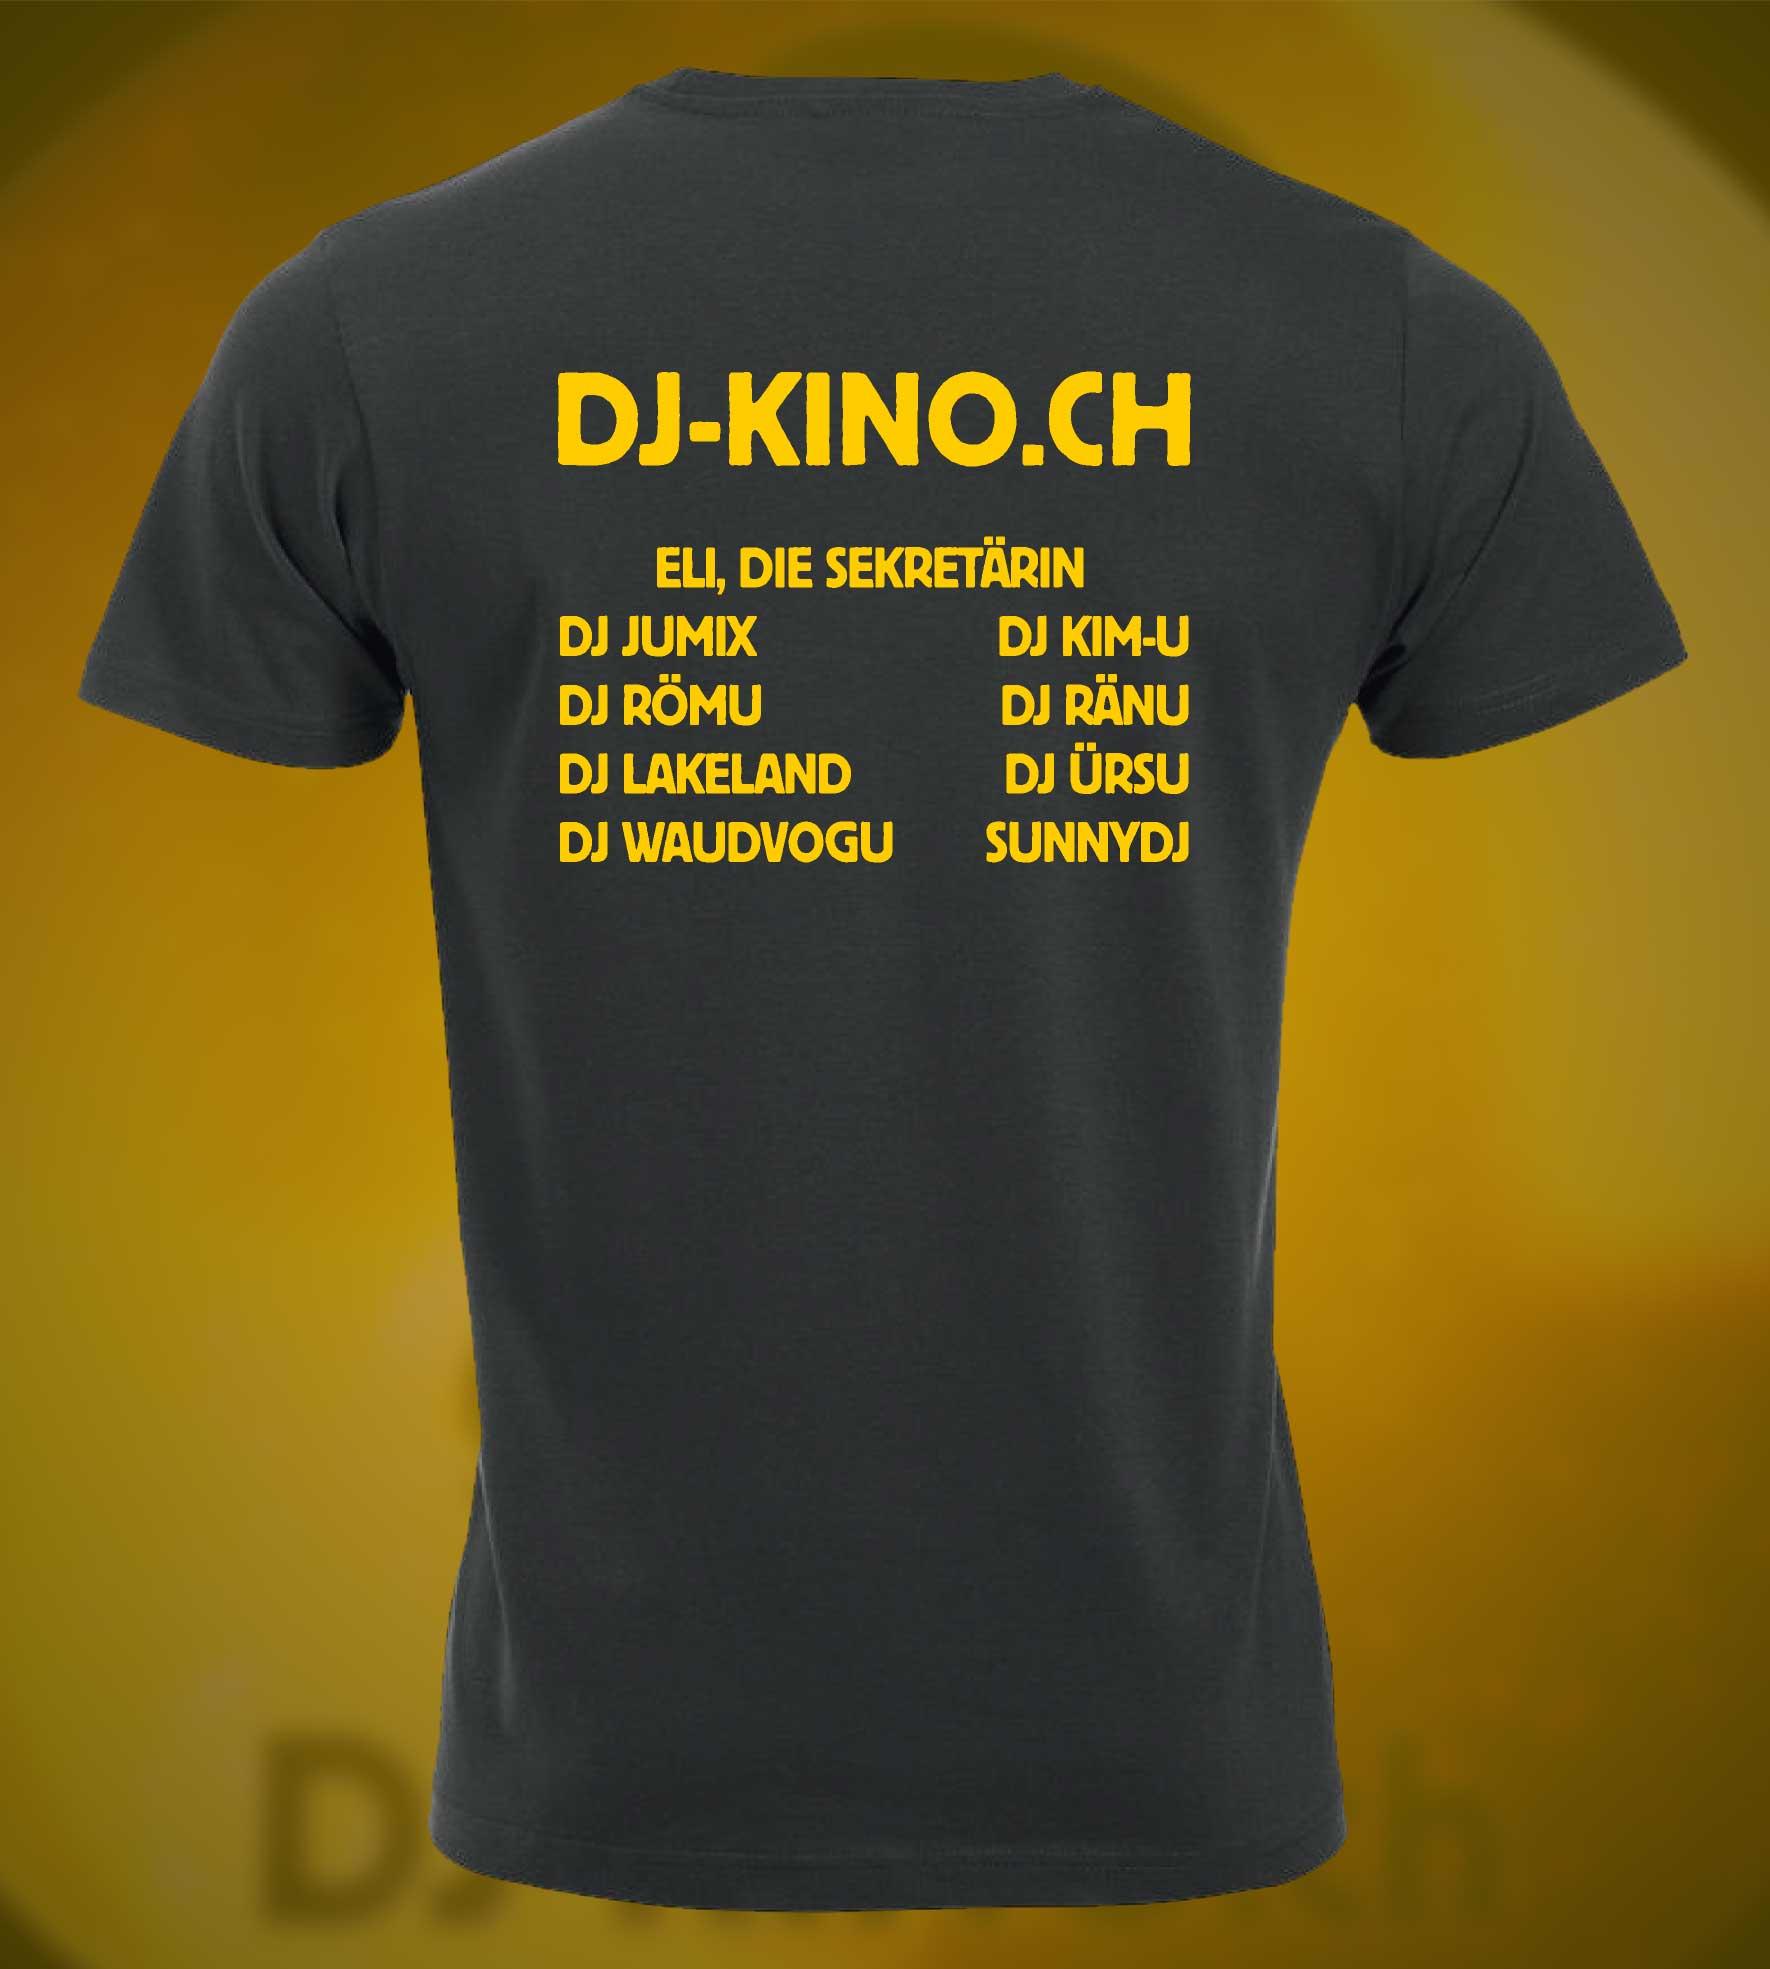 Fan-Shirt kaufen